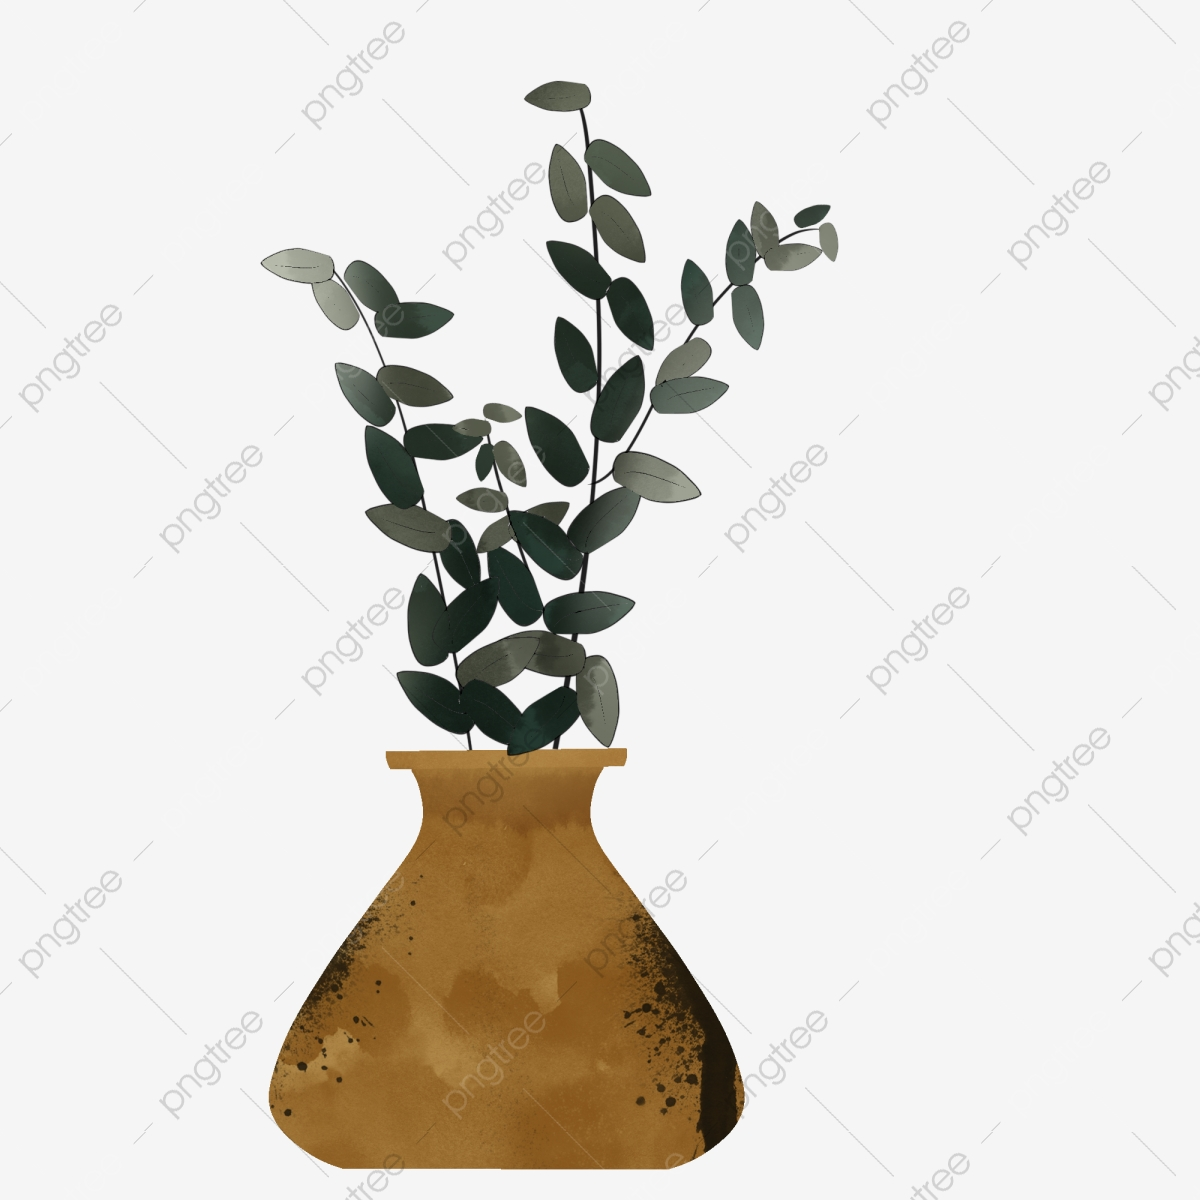 Plant Vine Flower Vase Original Hand Painted Wind Simple Small Fresh Elements Flower Pot Vase Flower Arrangement Png Transparent Clipart Image And Psd File For Free Download